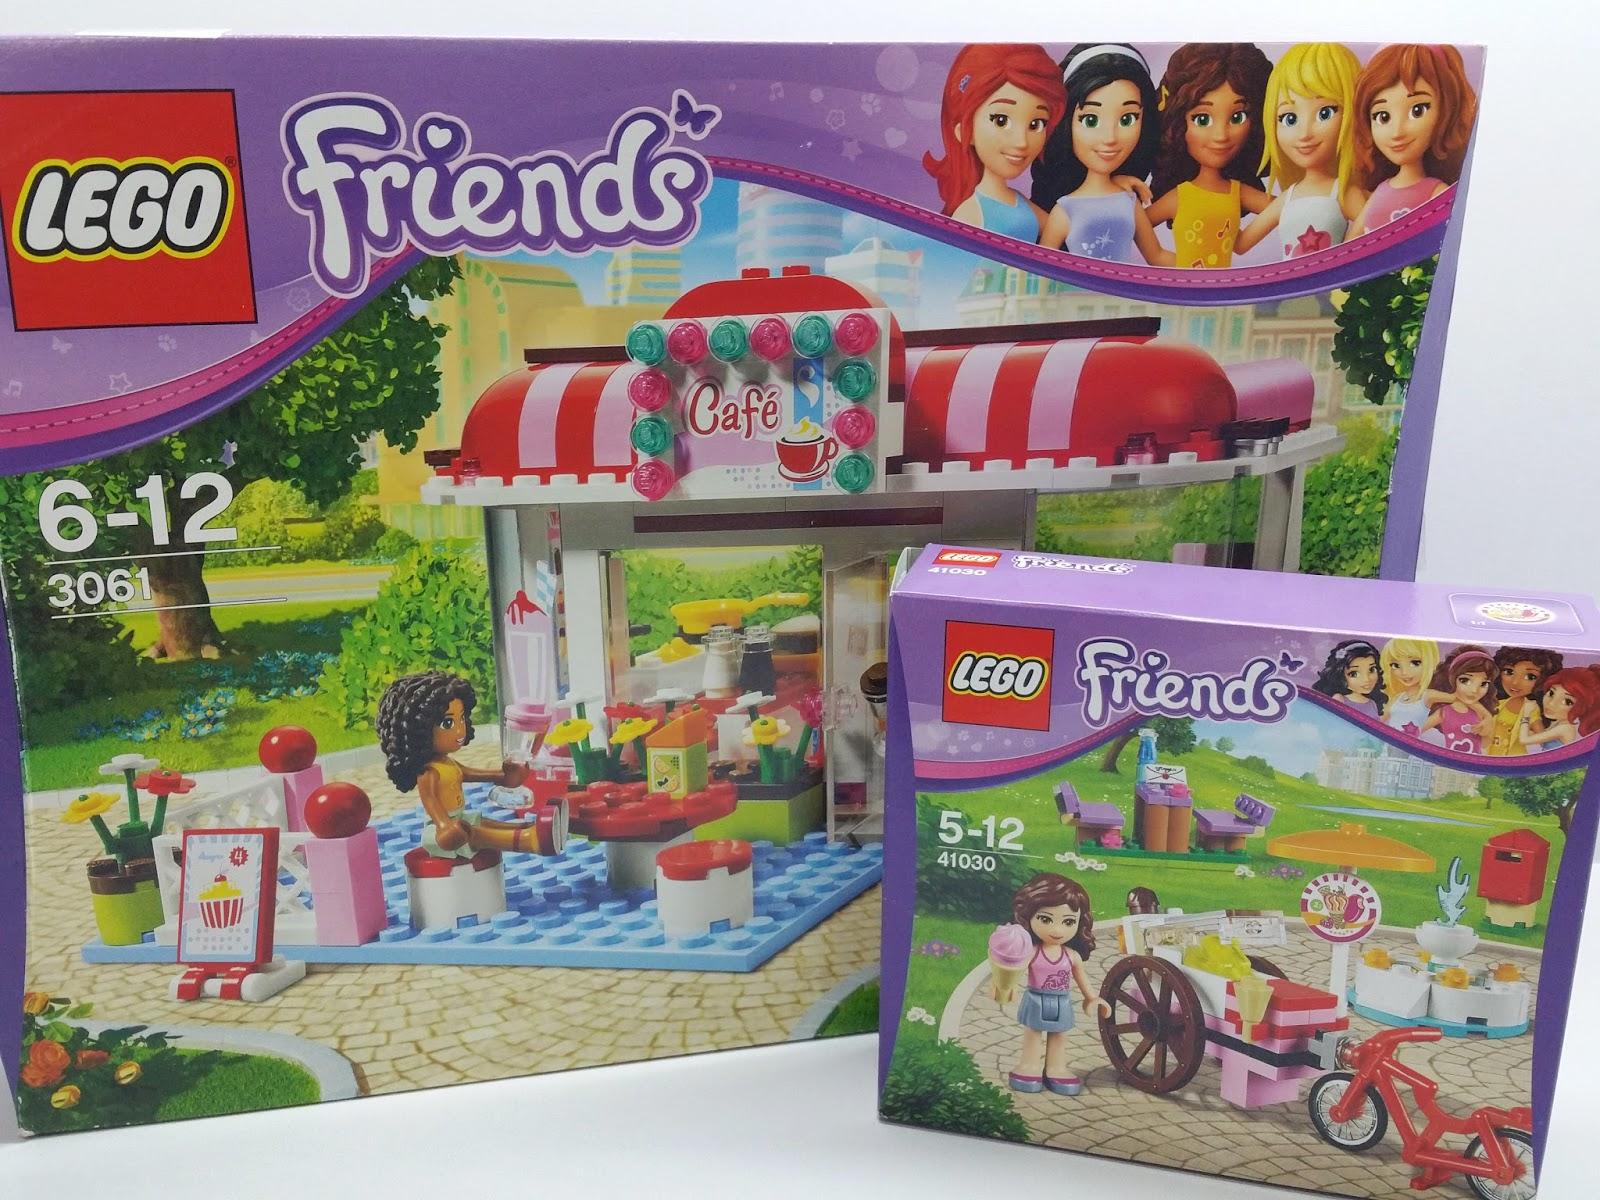 Lego Friends Moc City Park Cafe 3061 Olivias Ice Cream Bike